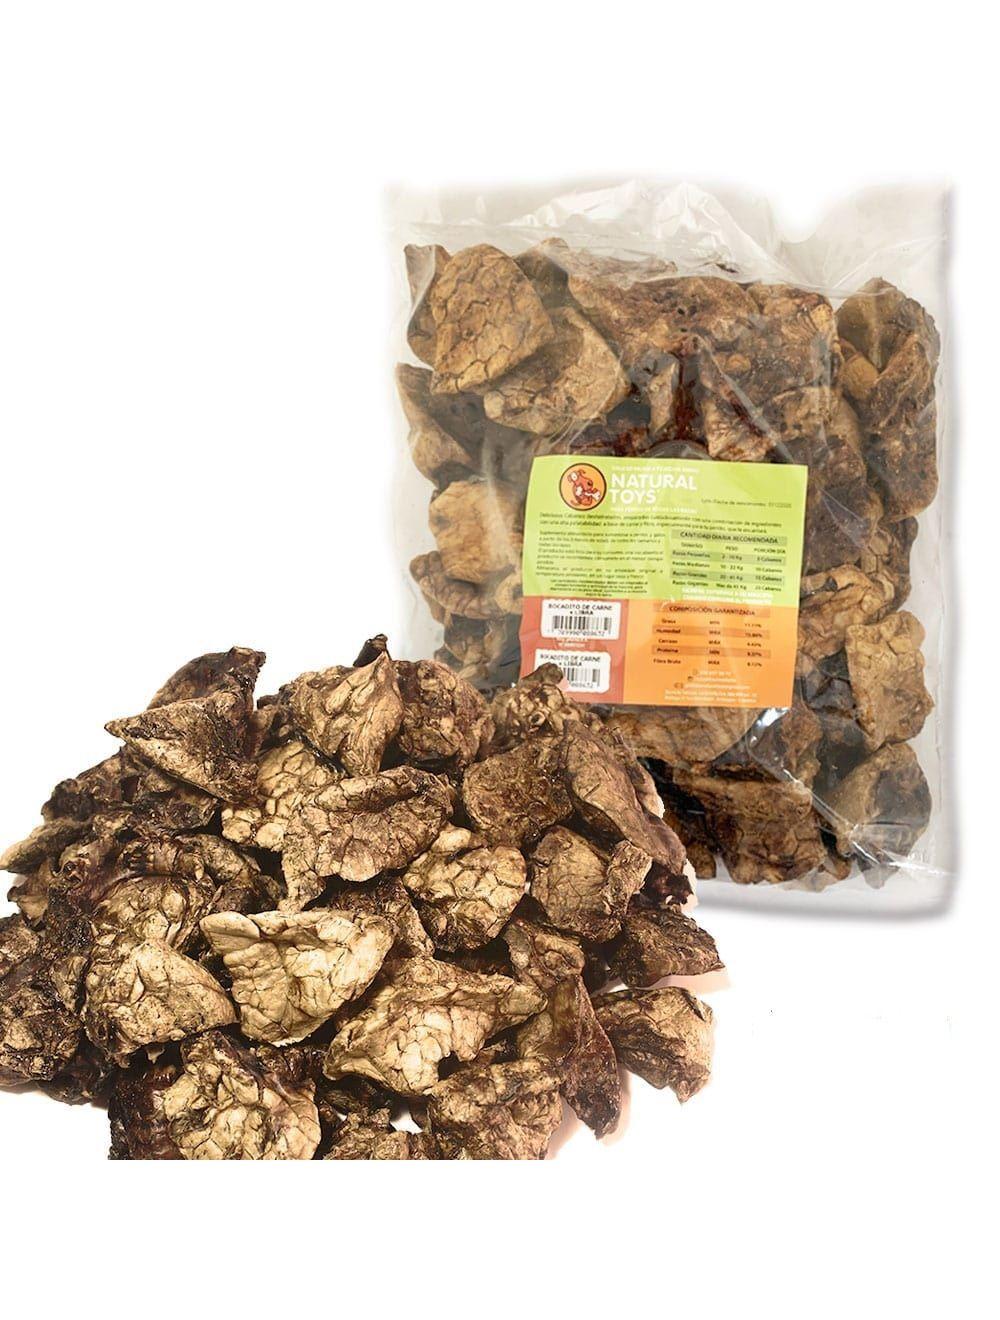 BOFE (Pulmón) NATURAL DESHIDRATADO 1 LB